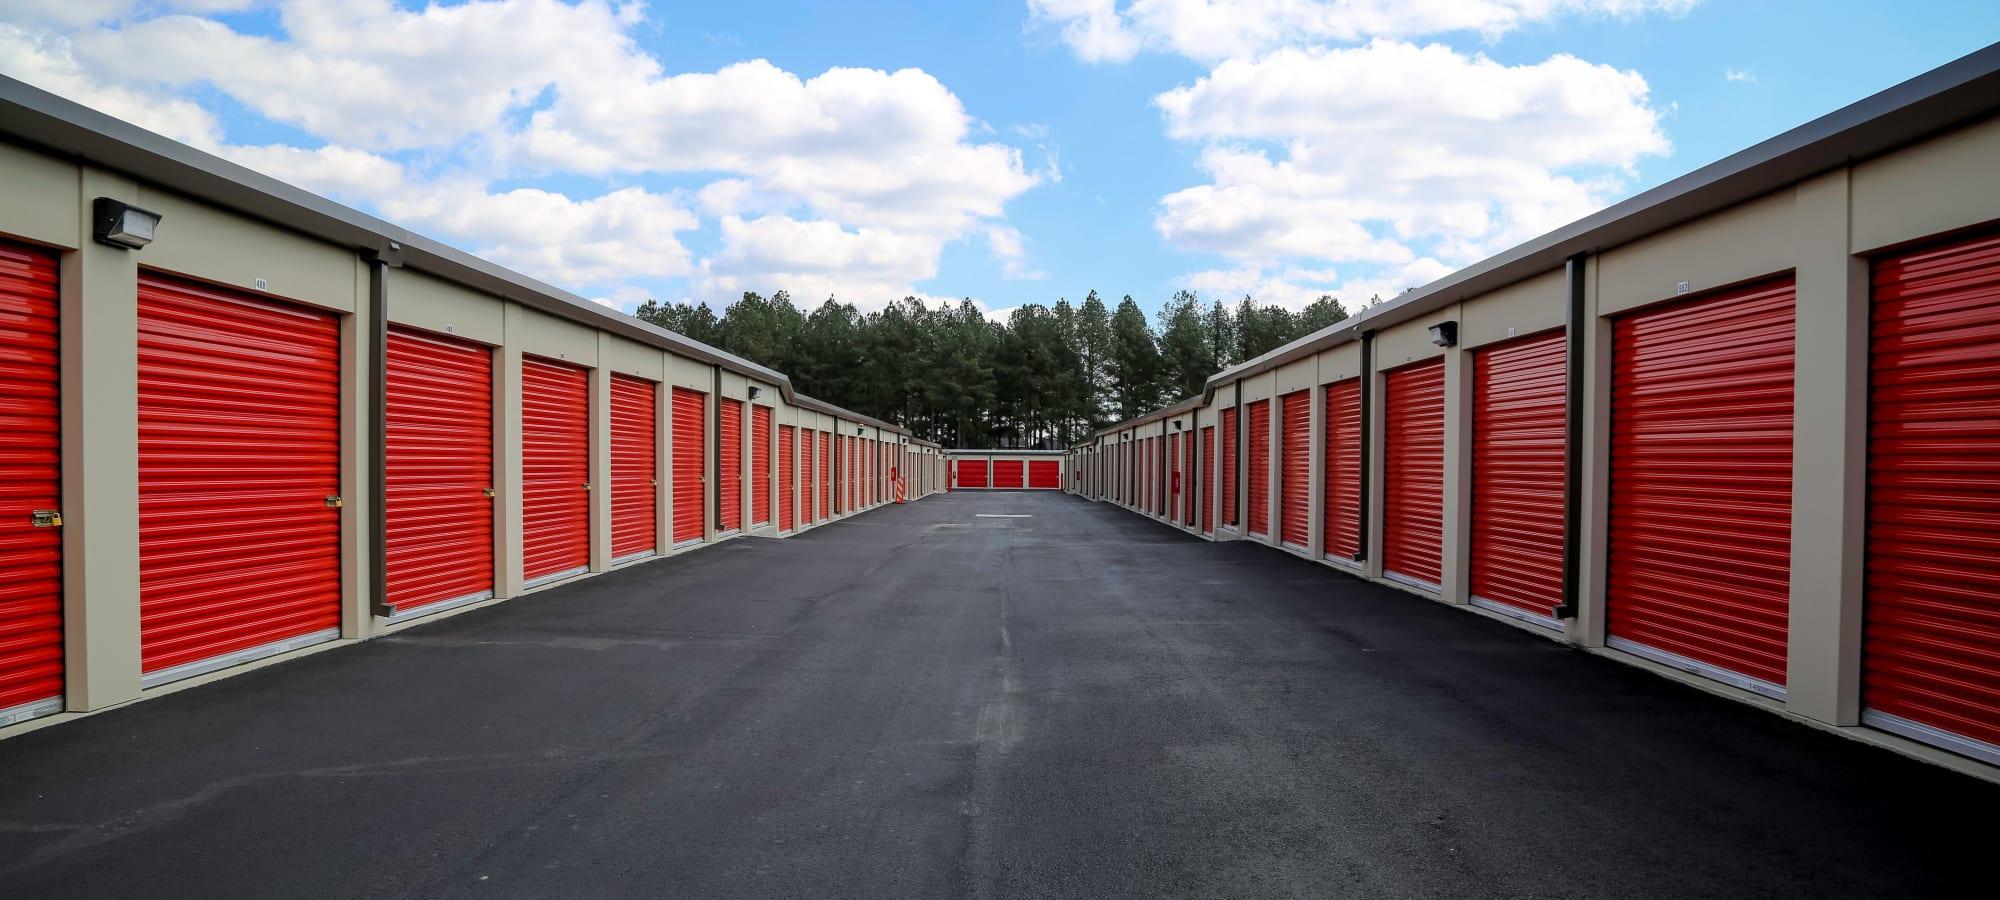 Storage options from Storage Units